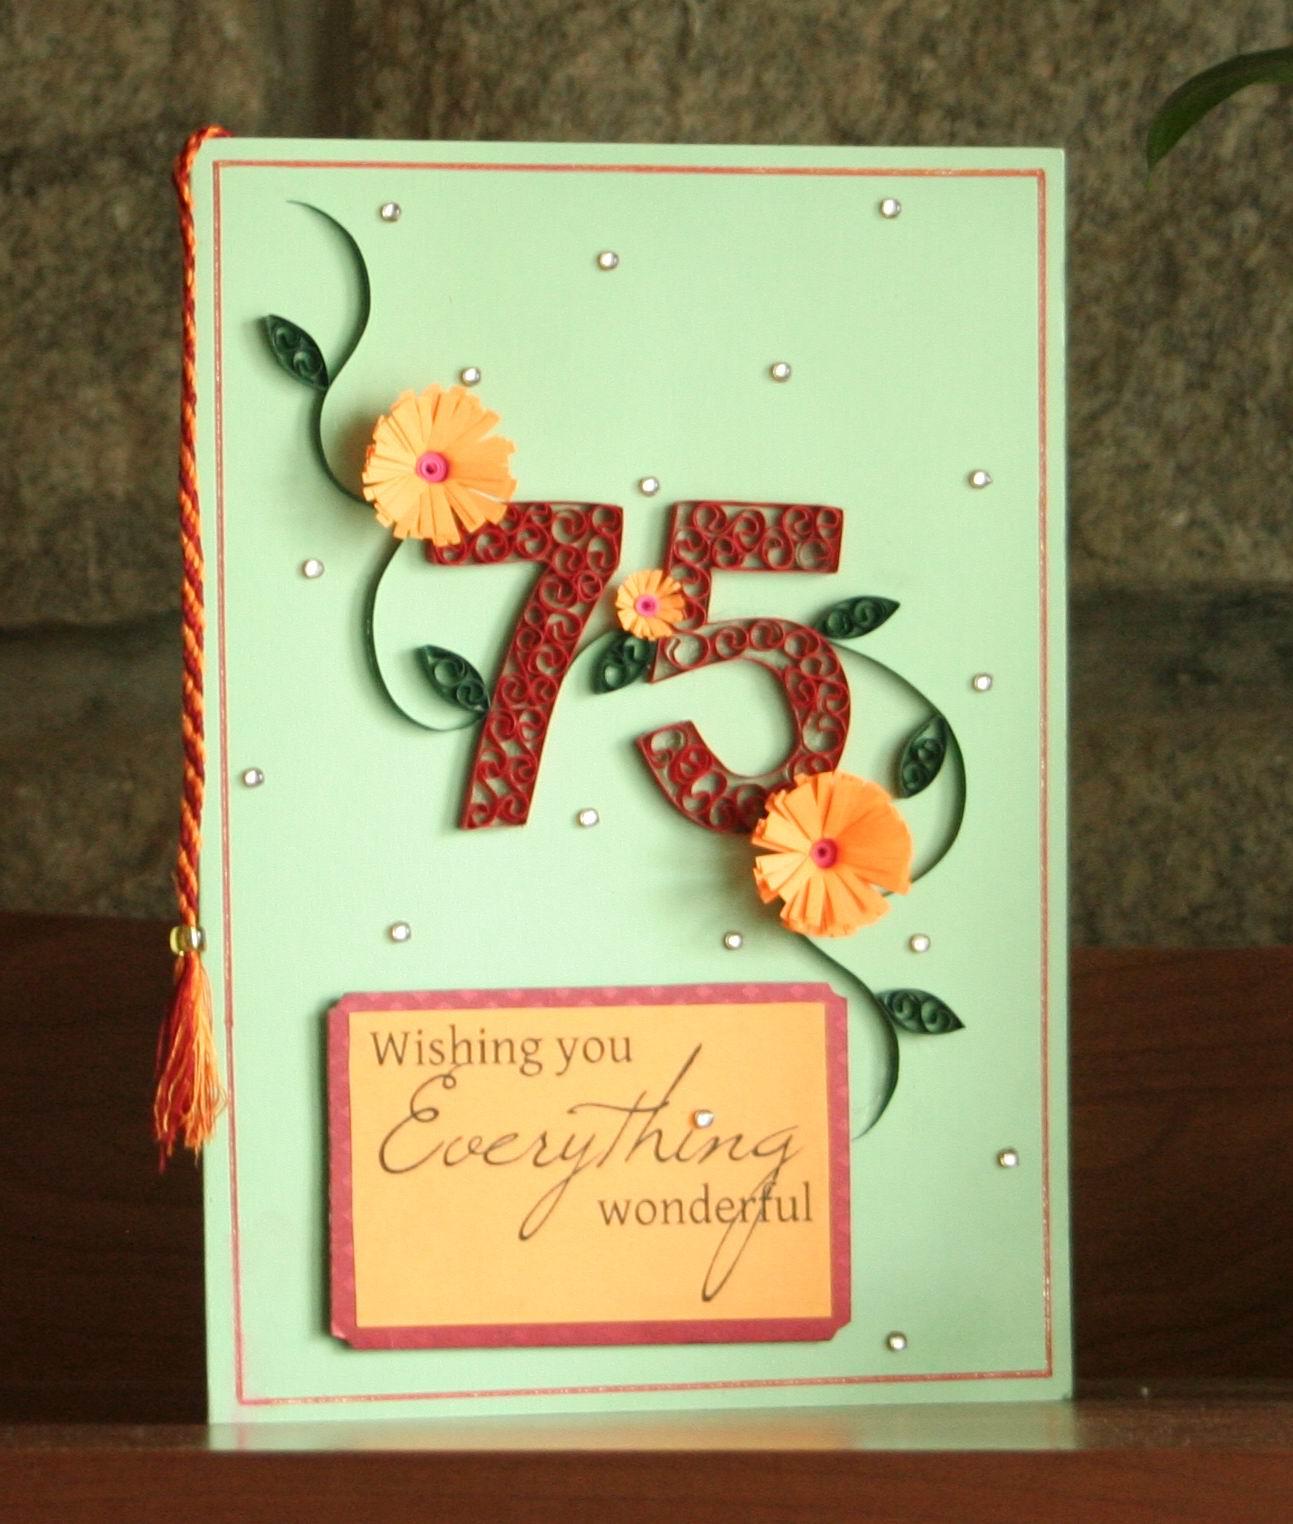 My Handmade Cards 75th Birthday